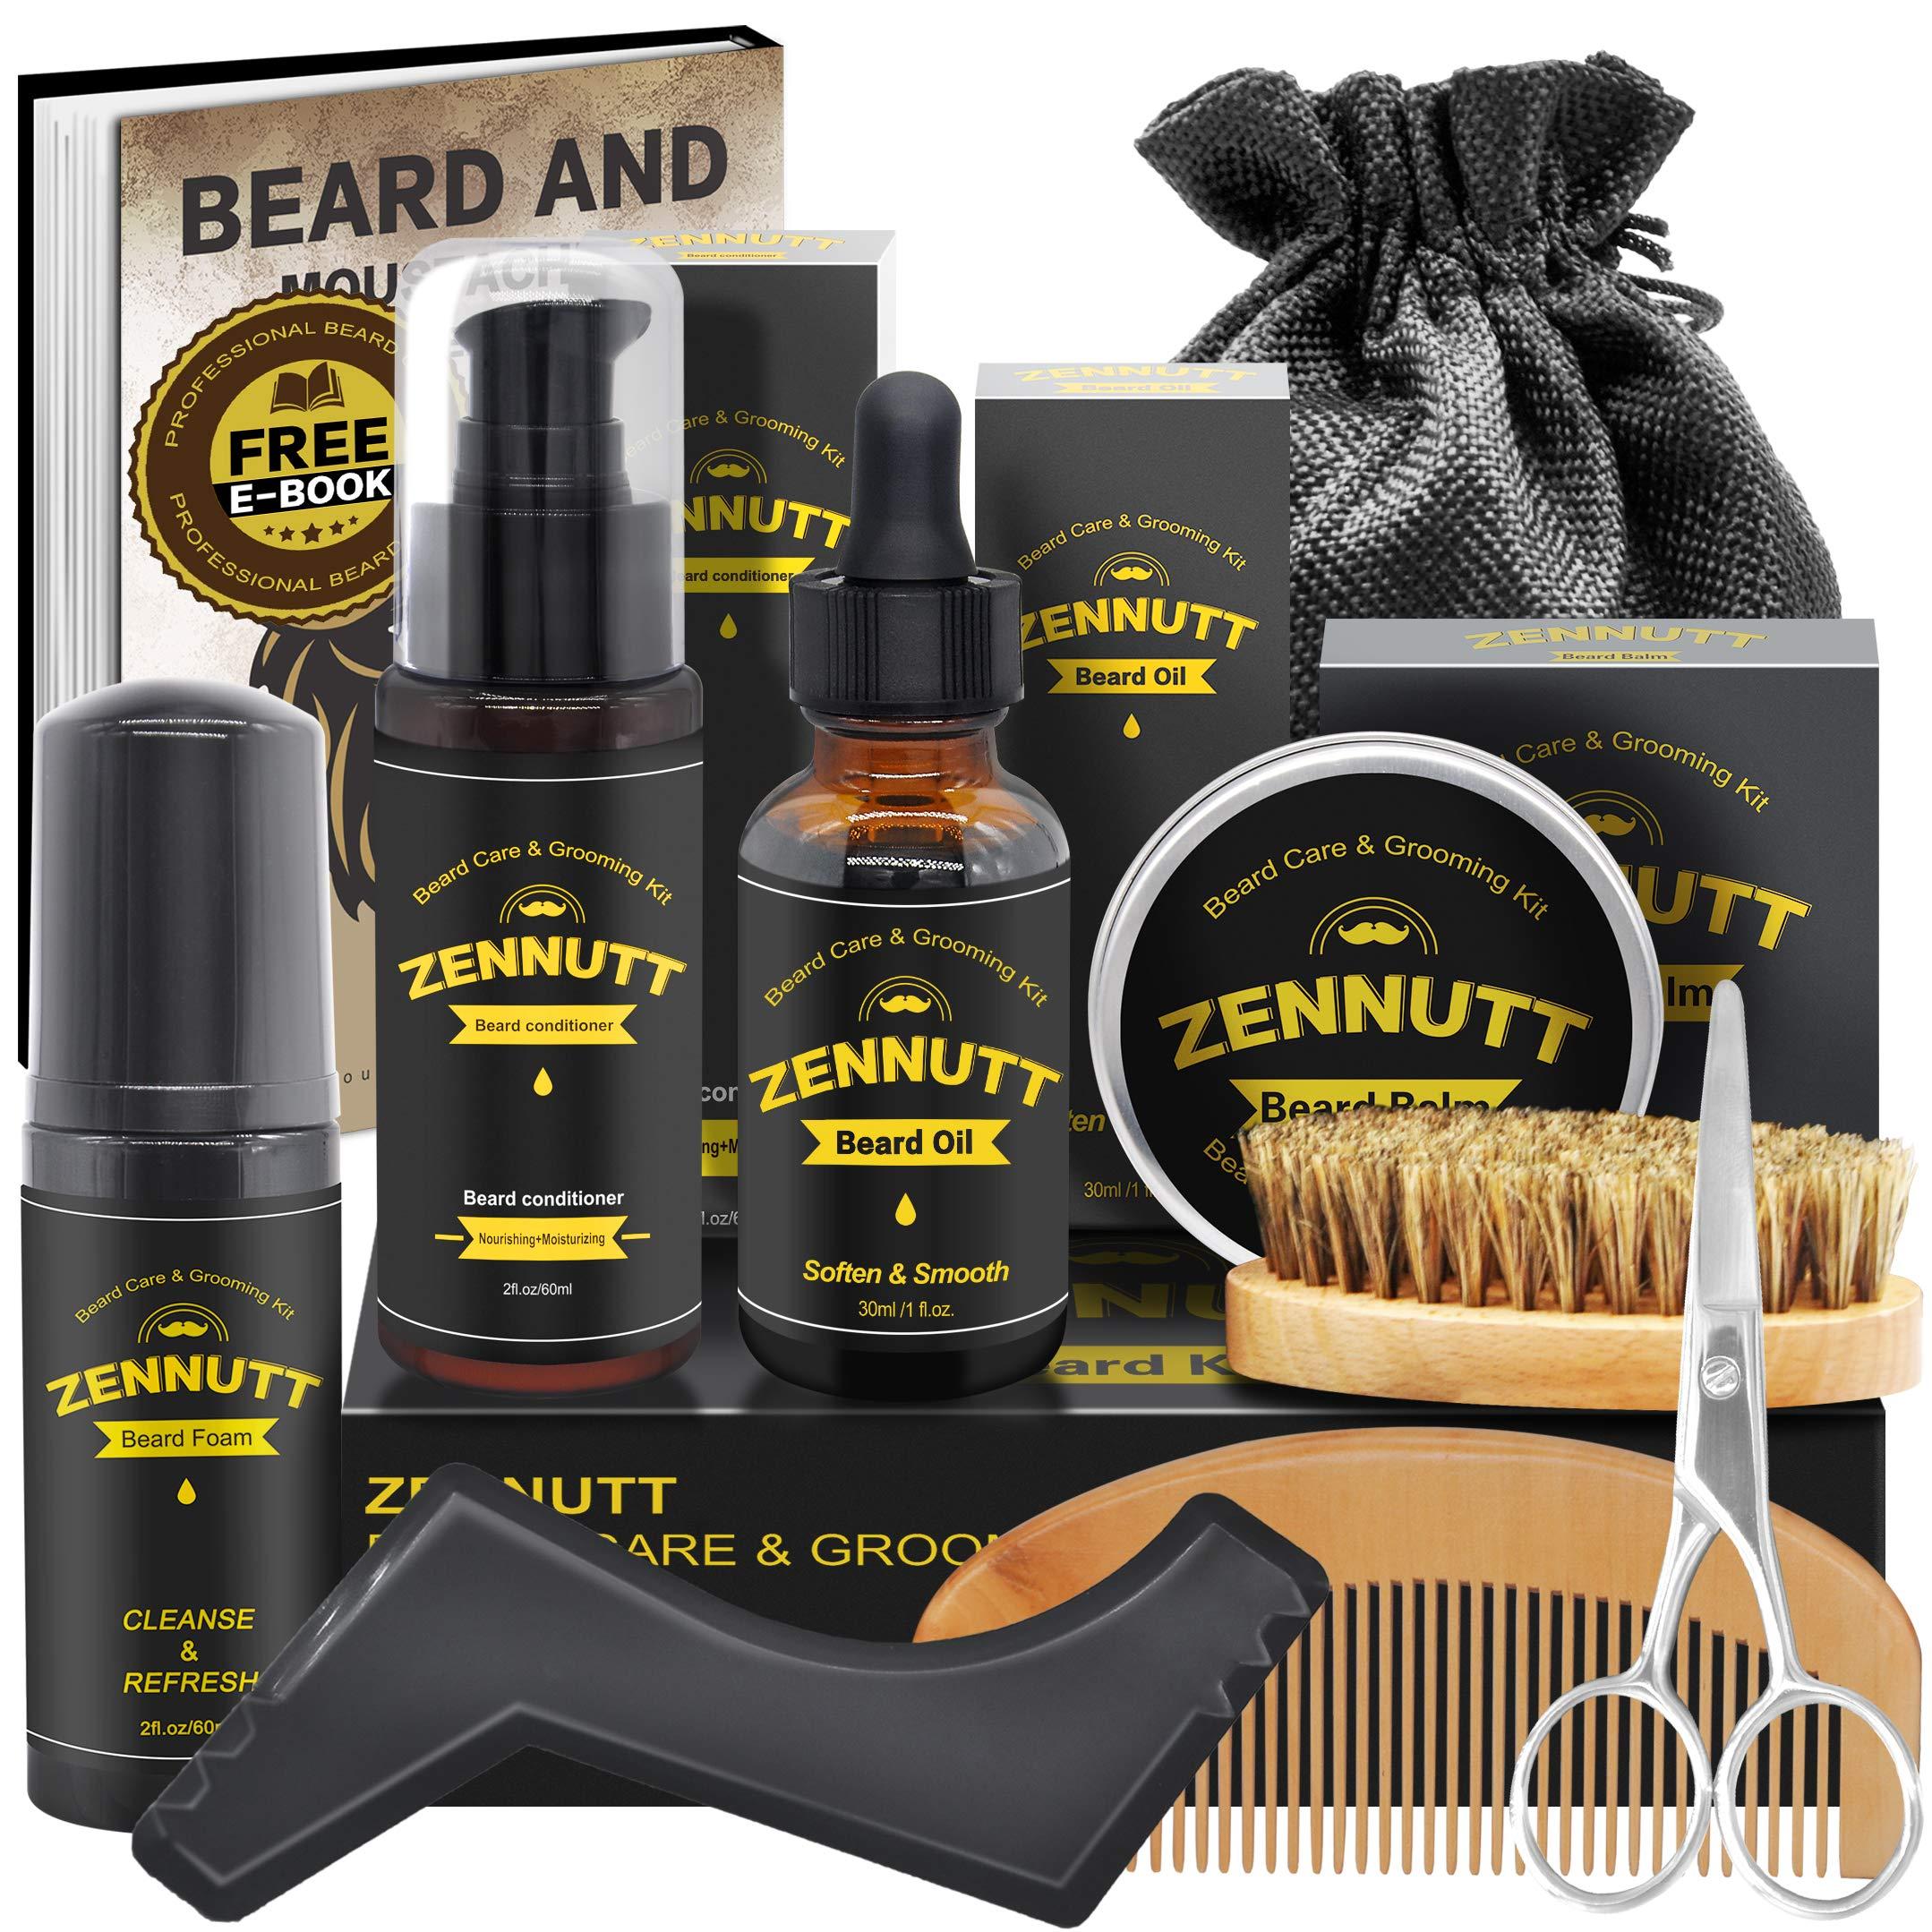 Beard Growth Kit,Beard Kit,Beard Grooming Kit w/Beard Foam,Beard Conditioner,Beard Growth Oil,Beard Balm,Brush,Comb,Scissor,Storage Bag,E-Book,Beard Care Kit for Men Stuff,Unique Christmas Gift Set